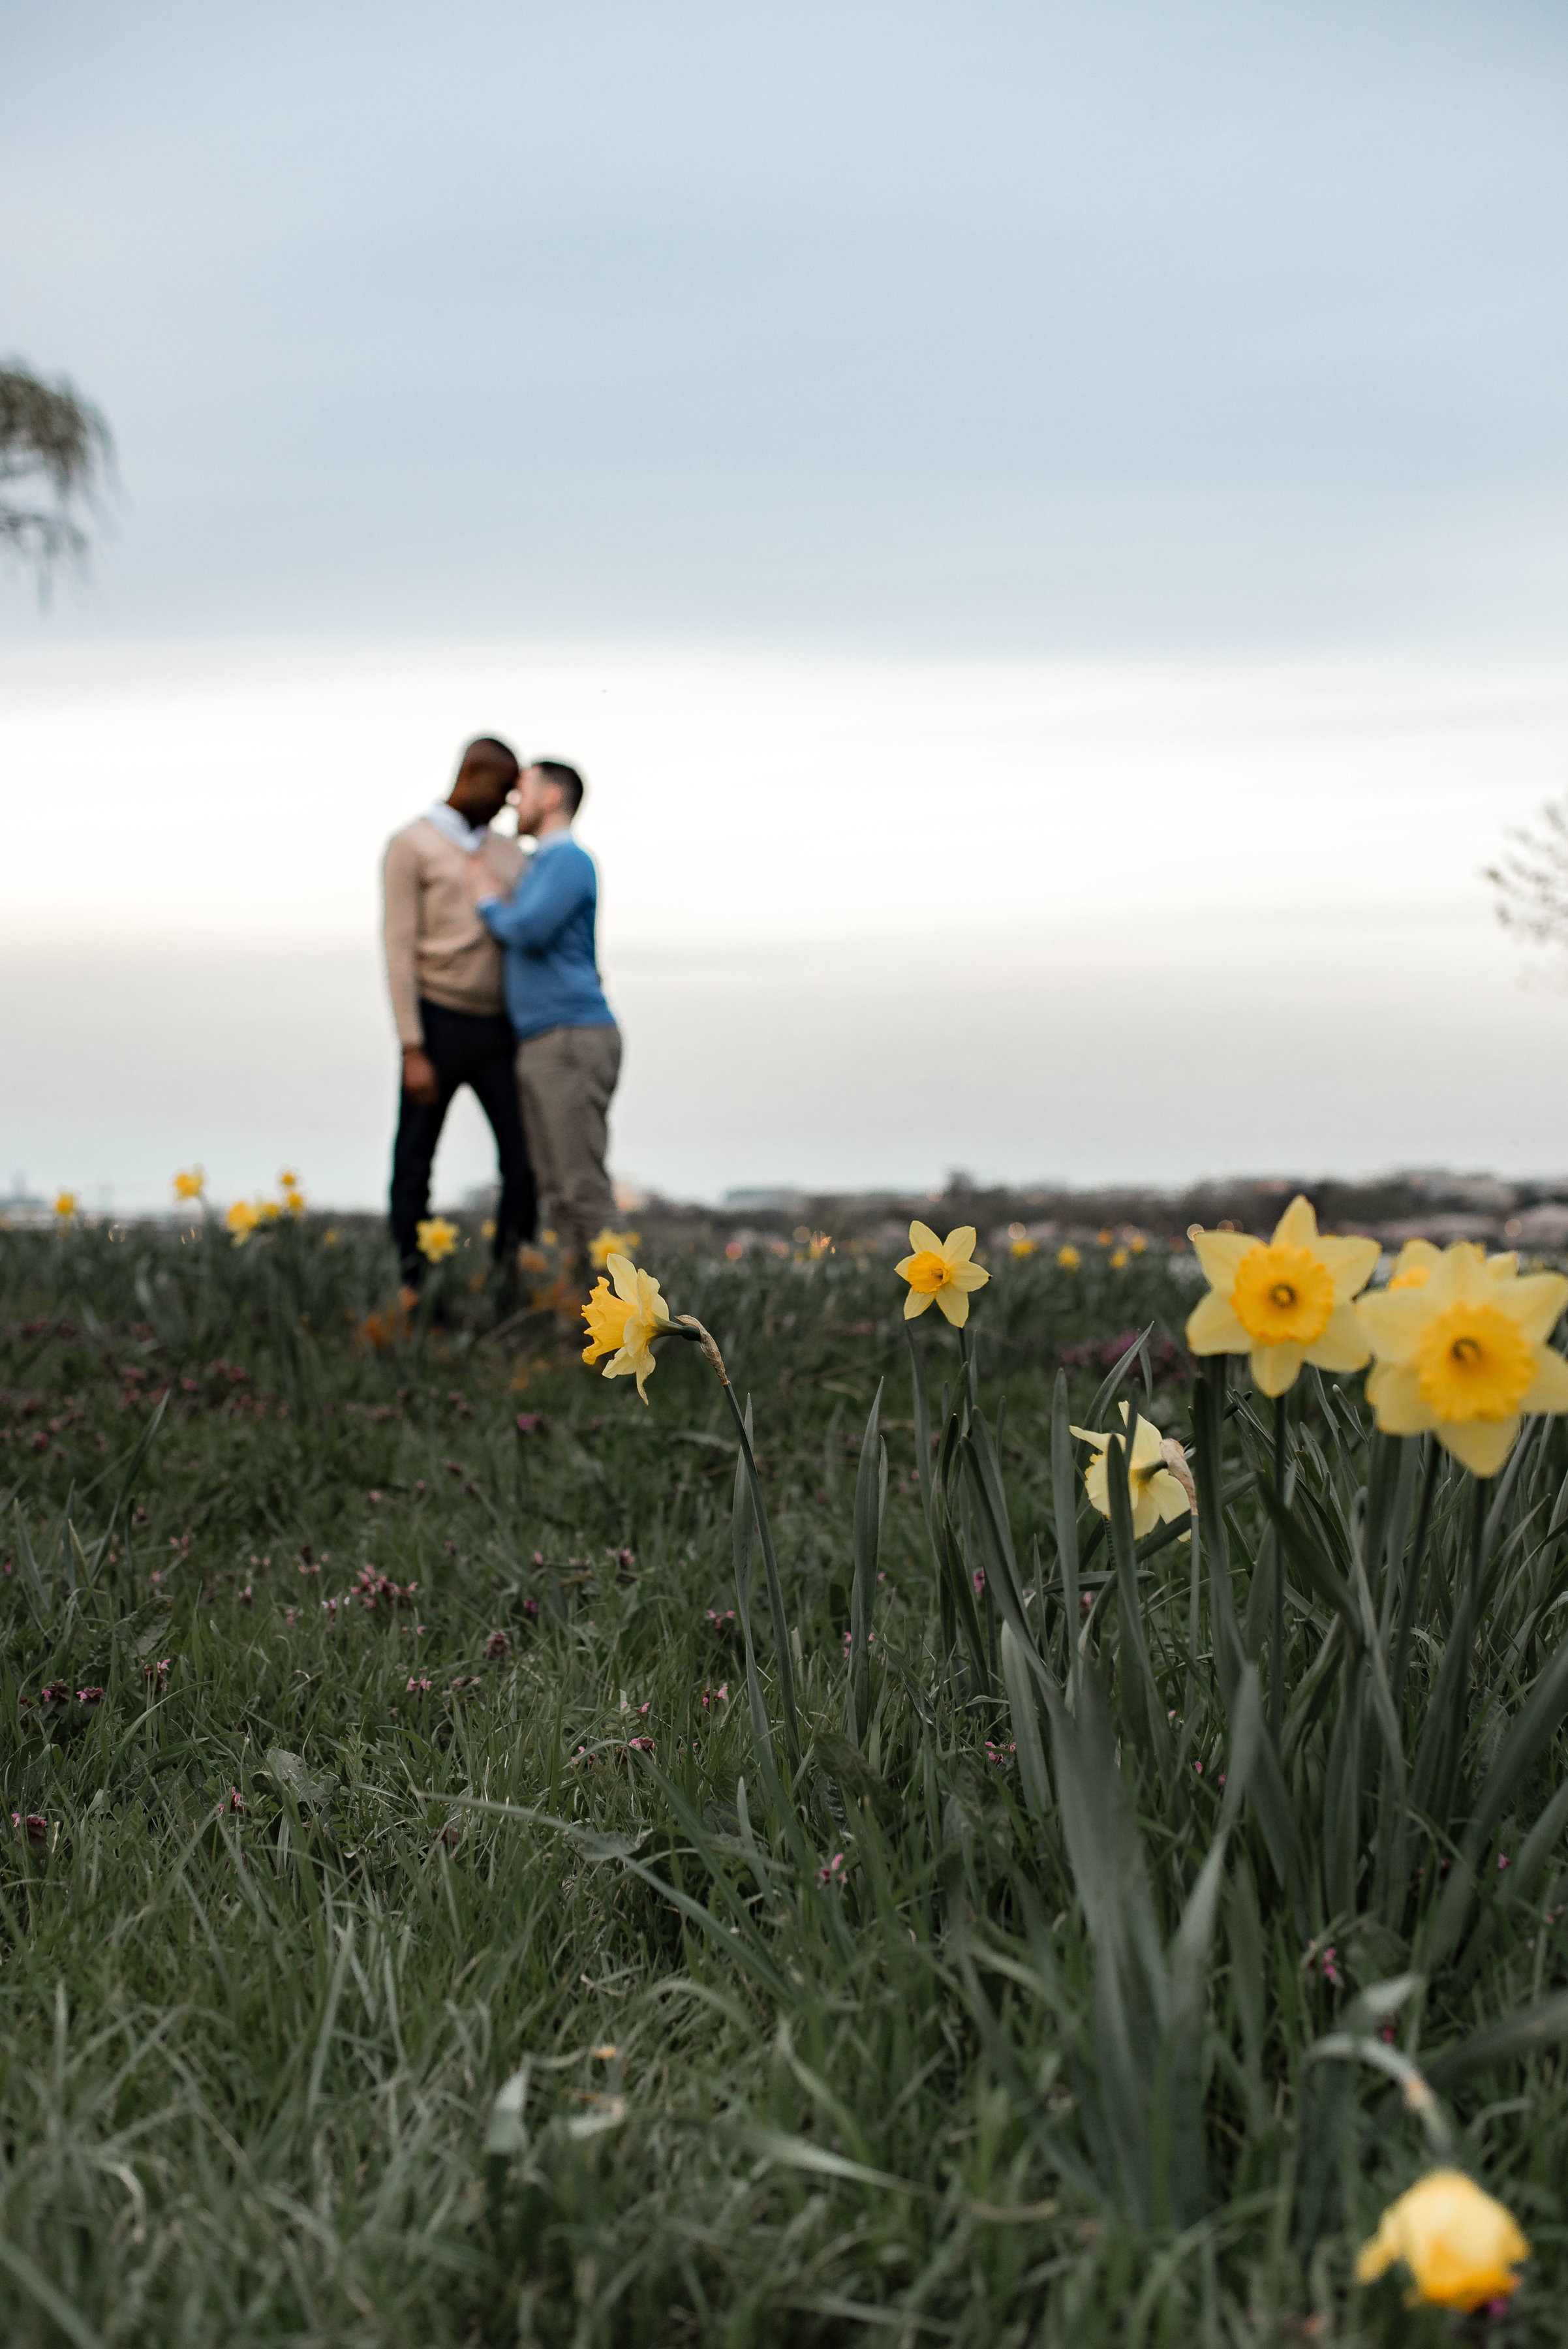 Erin-Fabio-Photography-2018-April-6-Ryan-Evan-Engaged-1067.jpg